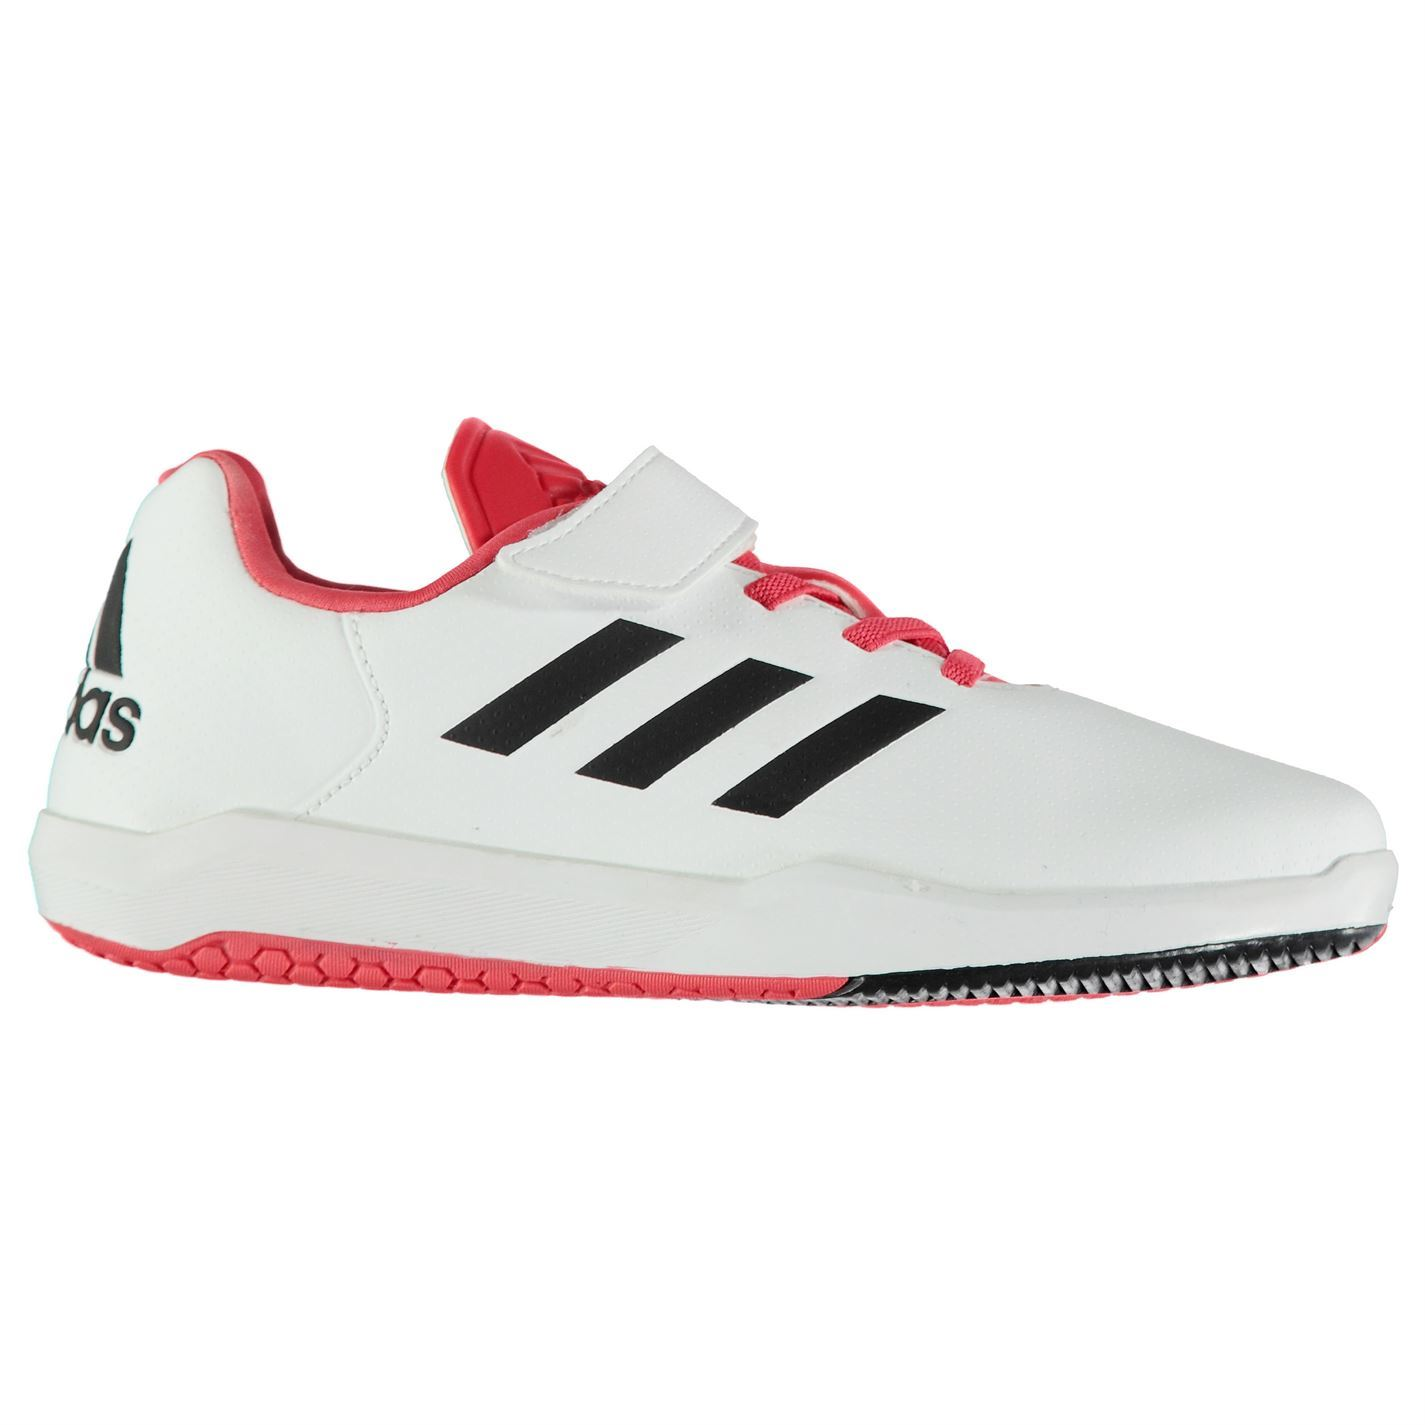 adidas-Kids-Boys-Altaturf-Predator-Junior-Trainers-Low-